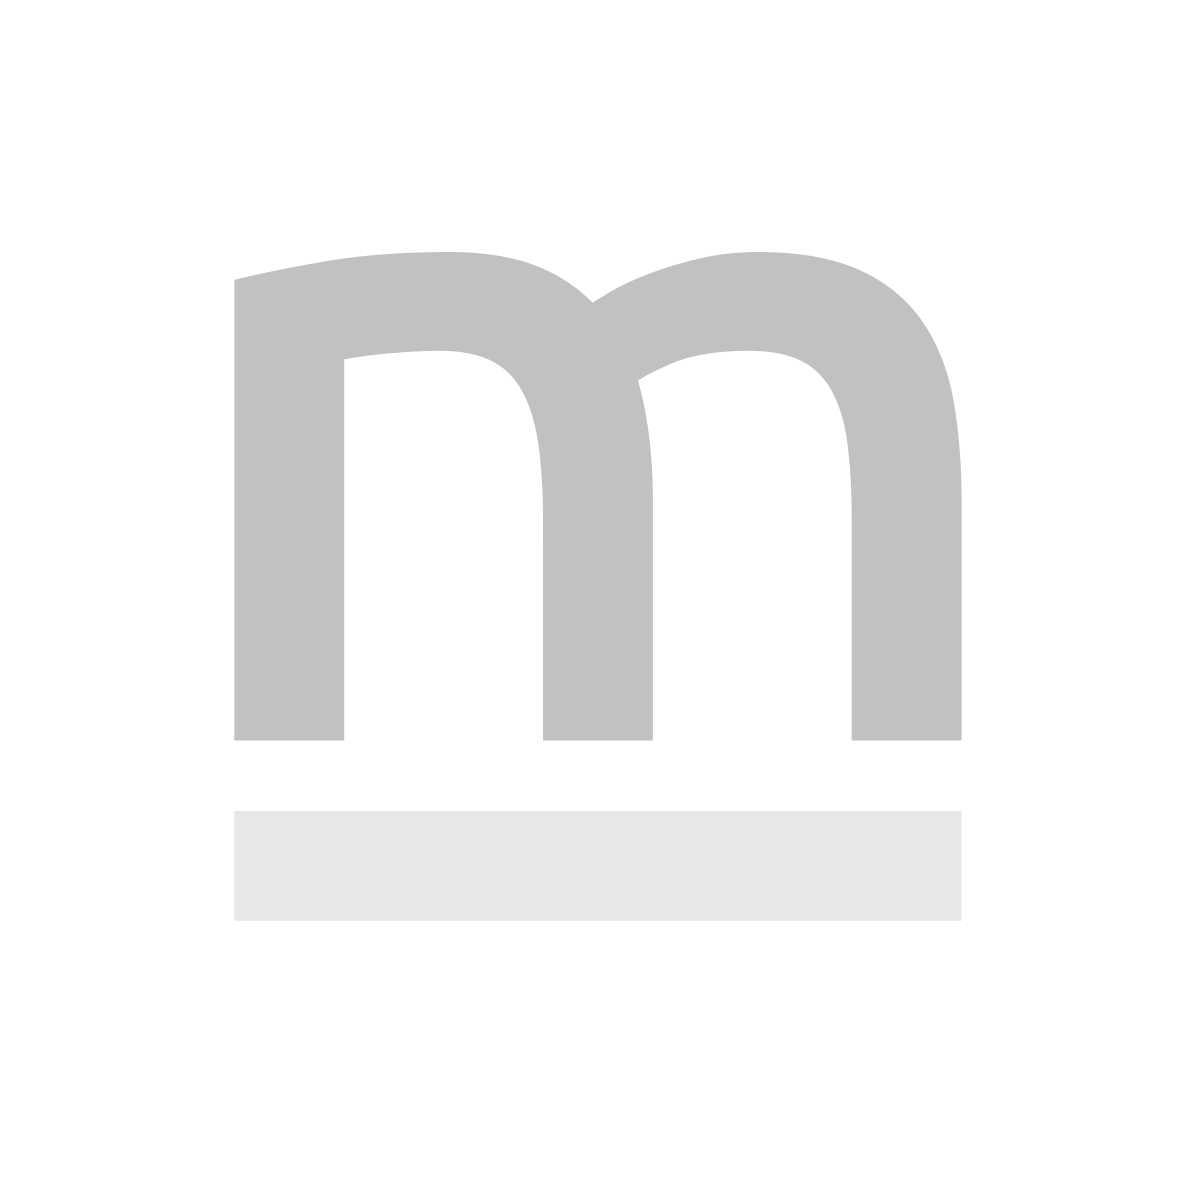 Krzesło CYPRIAN VELVET szare